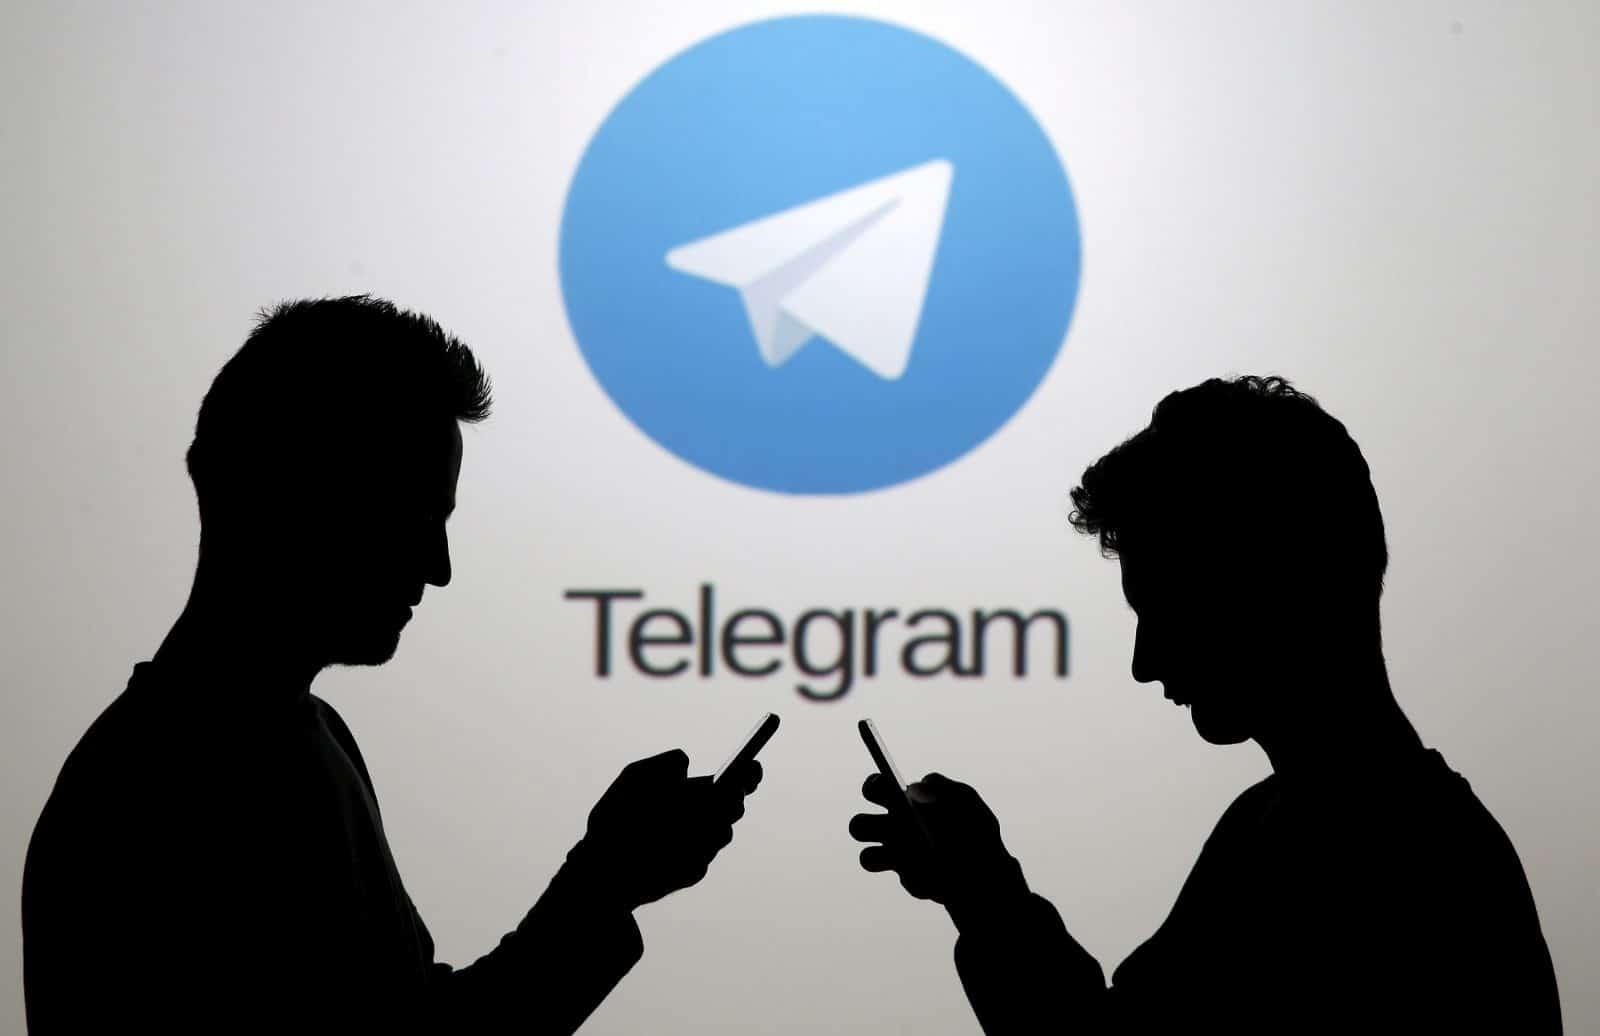 [object object] - Telefram Foto 2 Chat Segrete - Chat segrete Telegram: come funzionano